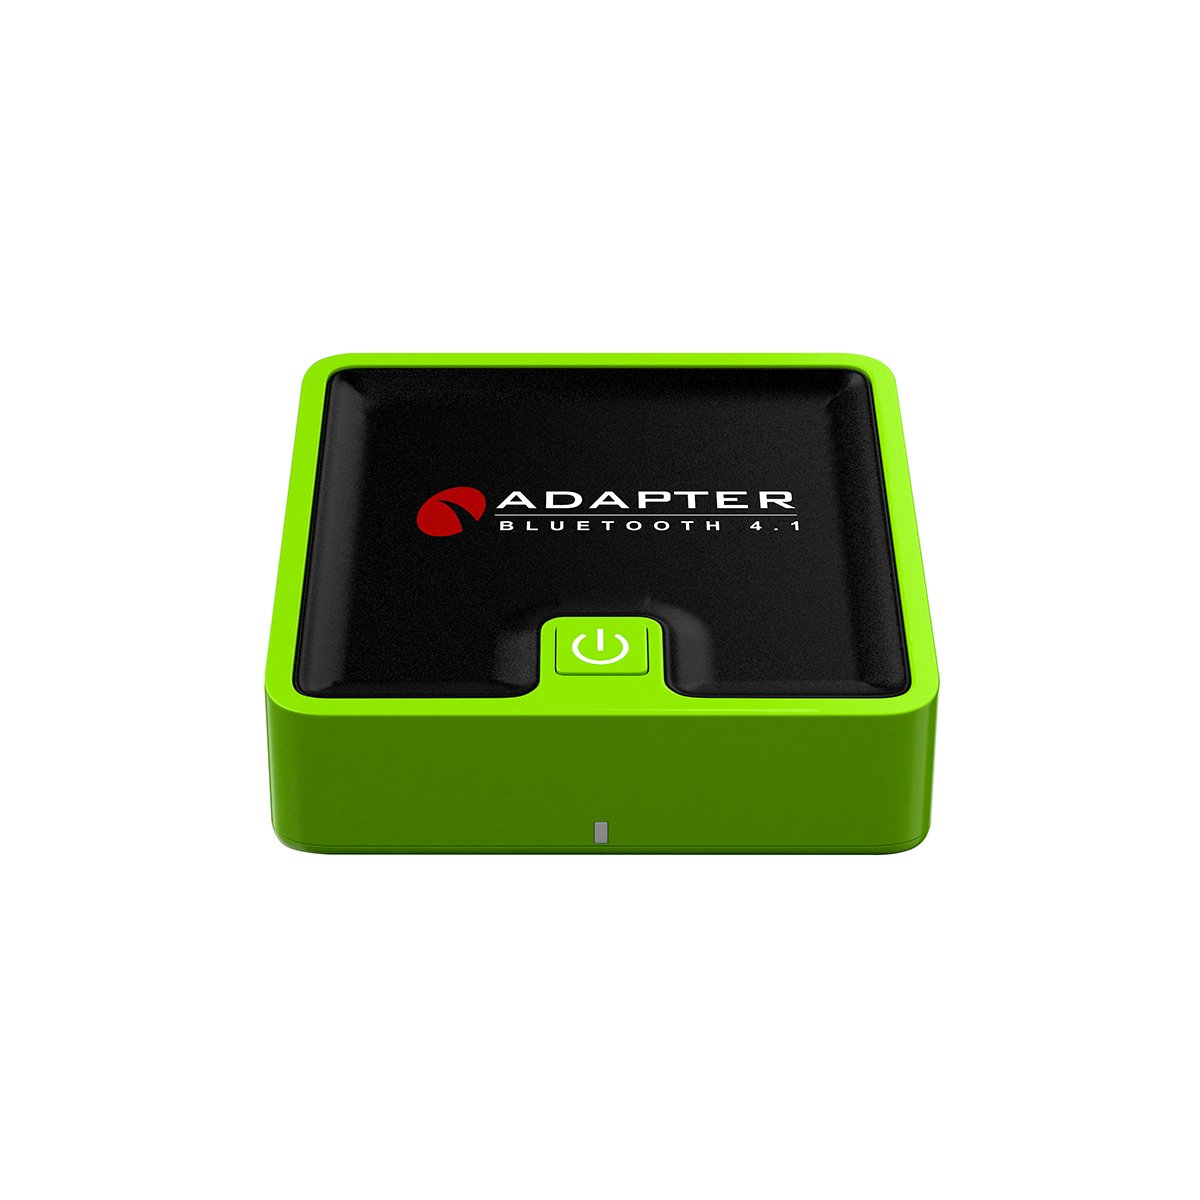 Vacio TI-039 Bluetooth 4.1 2in1 Transmitter Receiver Digital Optical Wireless Audio Adapter Support APT-X aptx / Wireless A2DP Audio Adapter with SPDIF & Aux 3.5mm -Green